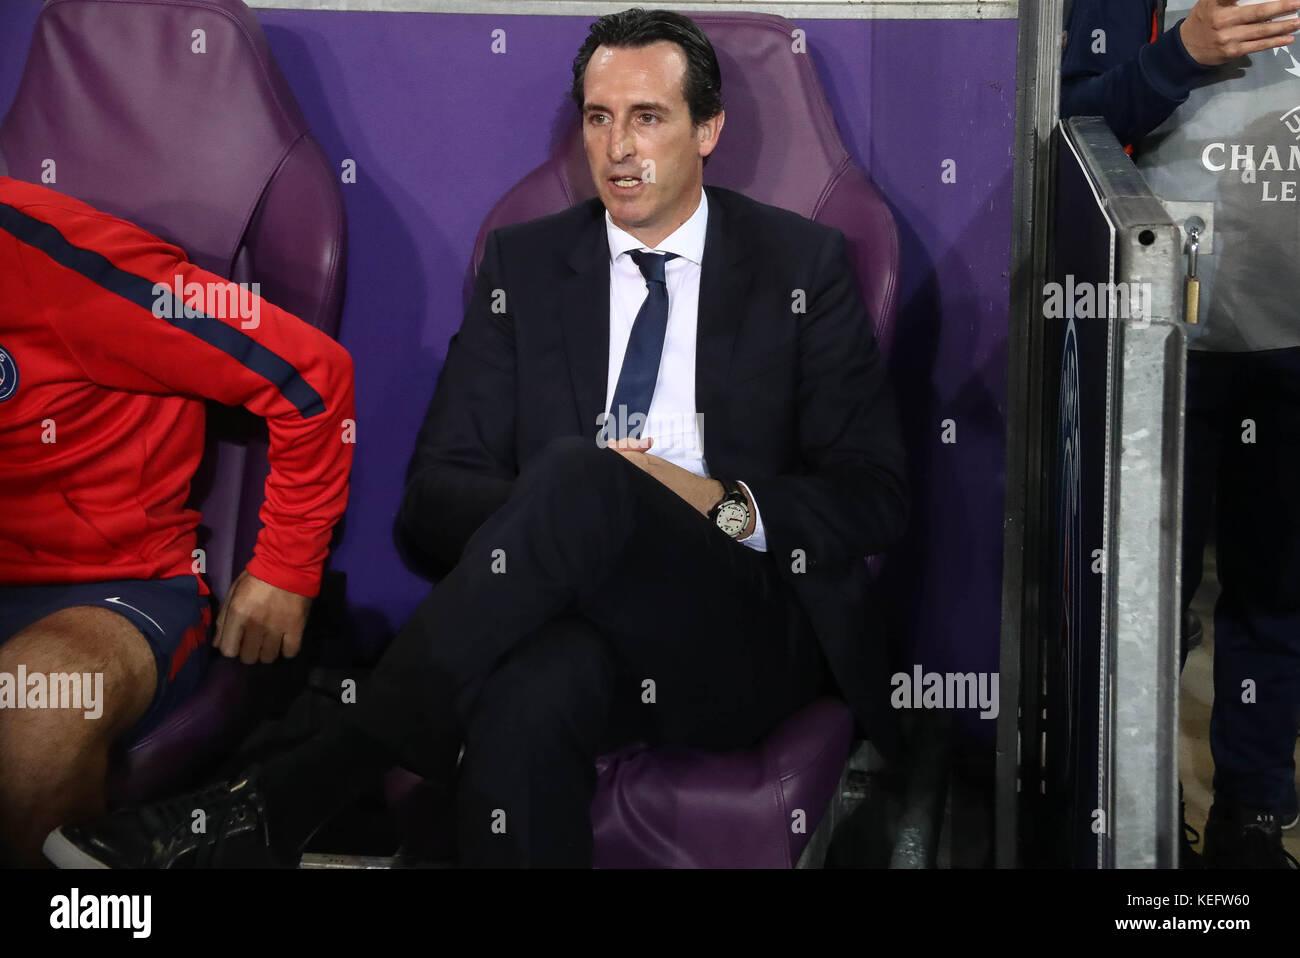 Anderlecht, Belgium. 18 October 2017. Unai Emery (Paris Saint Germain) during the match of Champions League Anderlecht - Stock Image